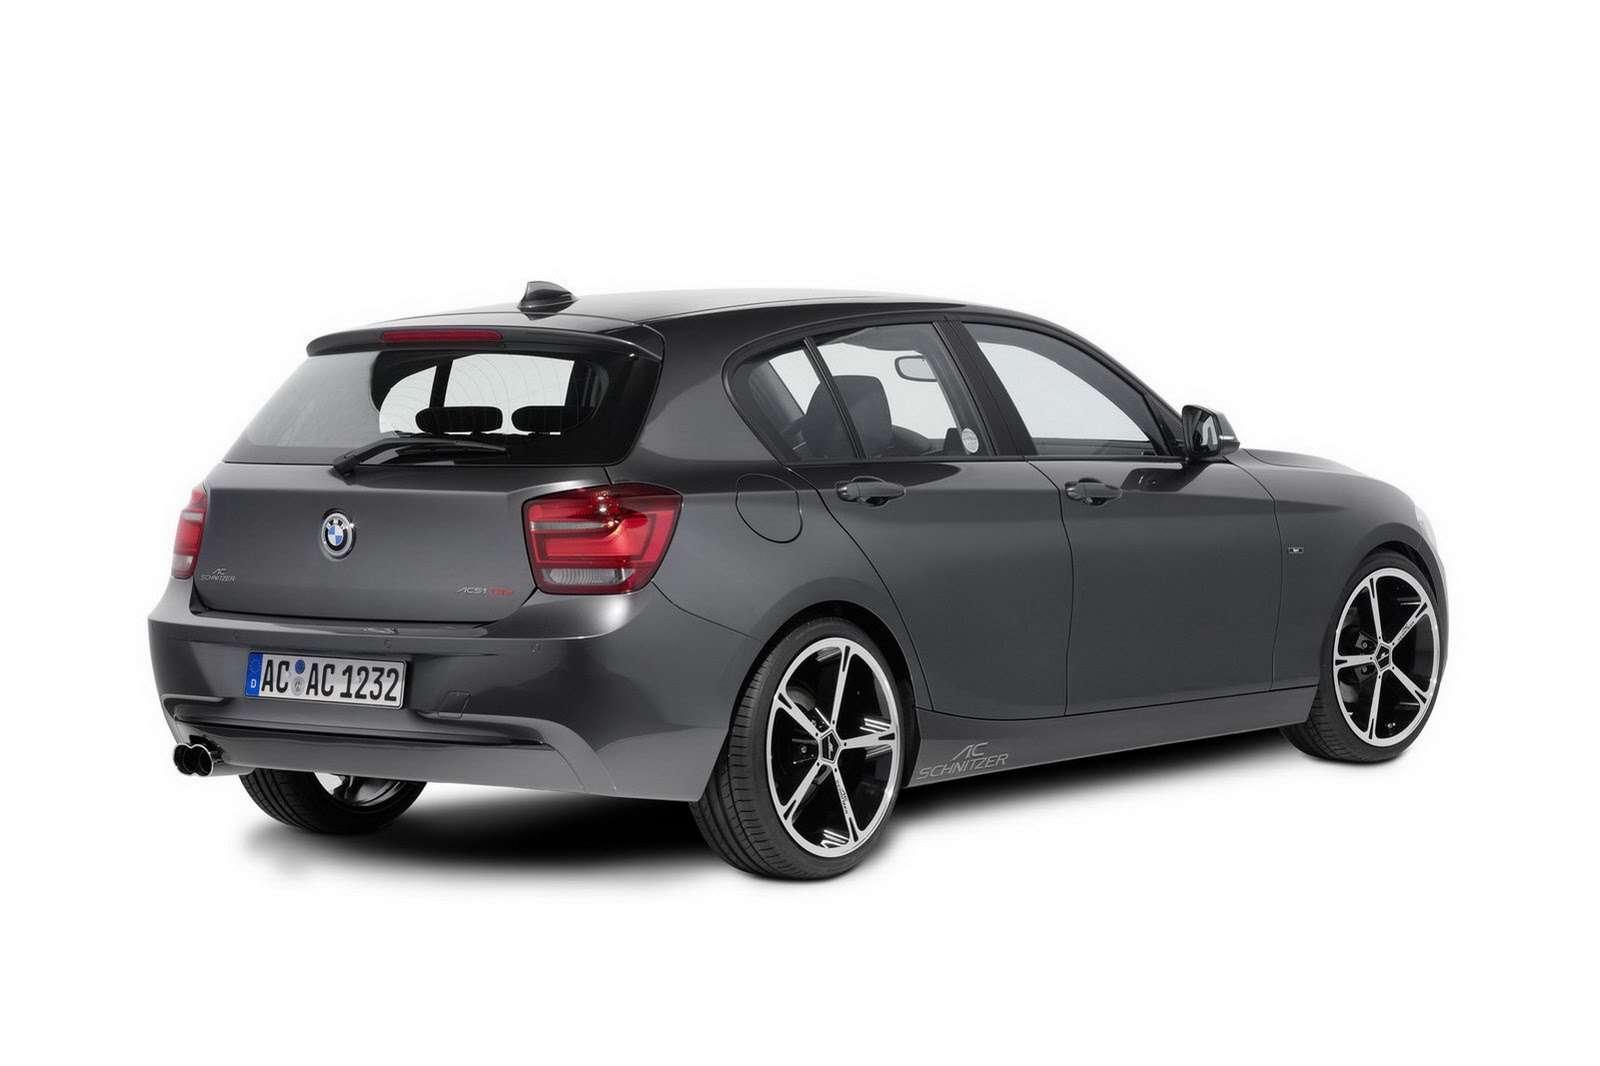 BMW serii 1 F20 AC Schnitzer fot listopad 2011